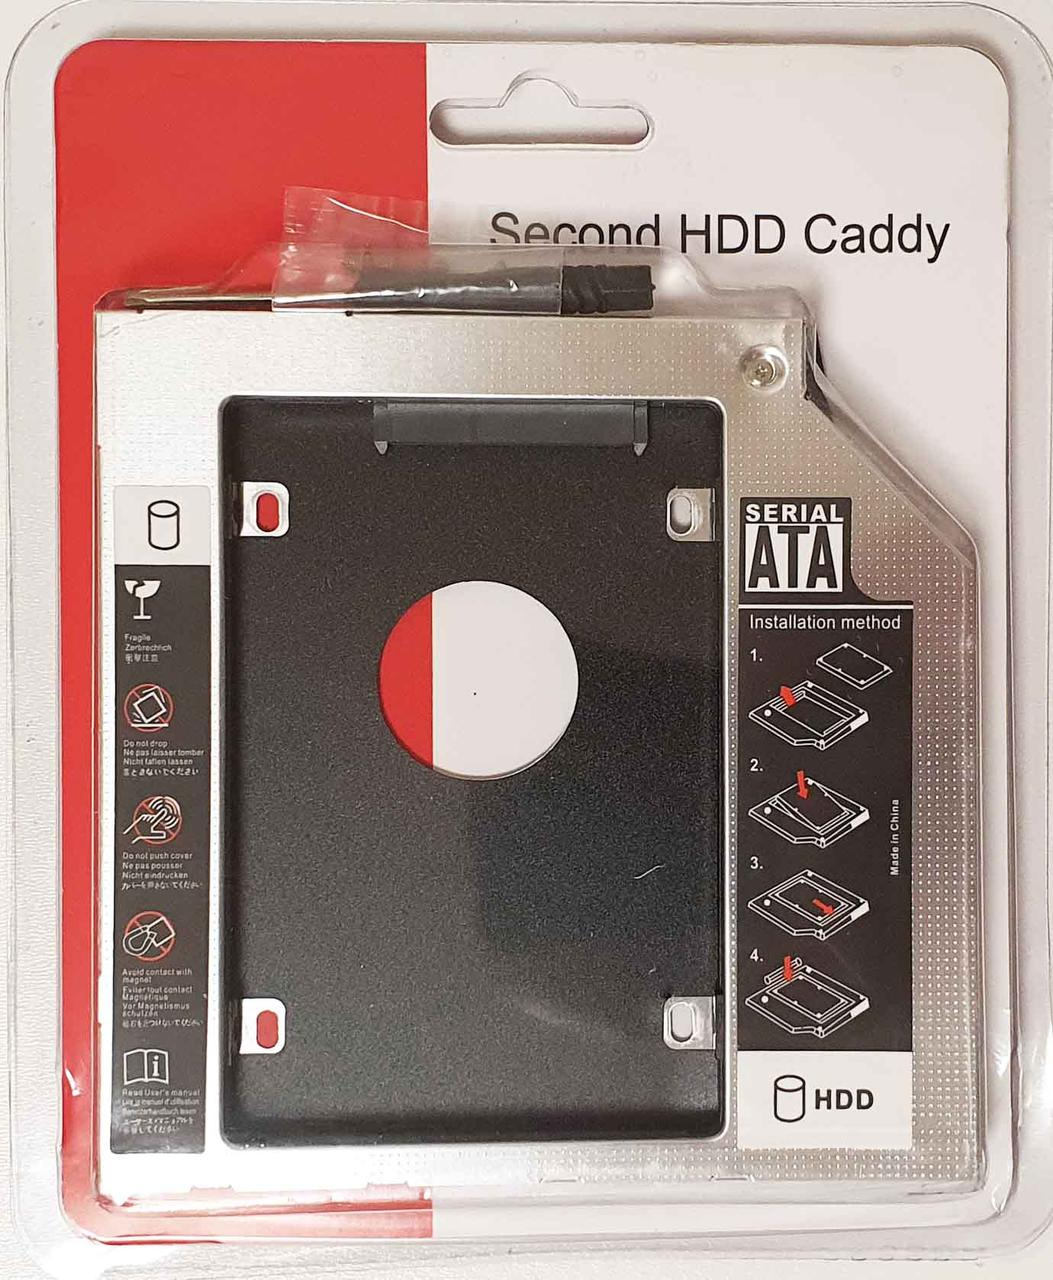 10 шт. Карман для установки второго жесткого диска SATA в отсек DVD 12.7 мм SATA (optibay caddy) алюминий